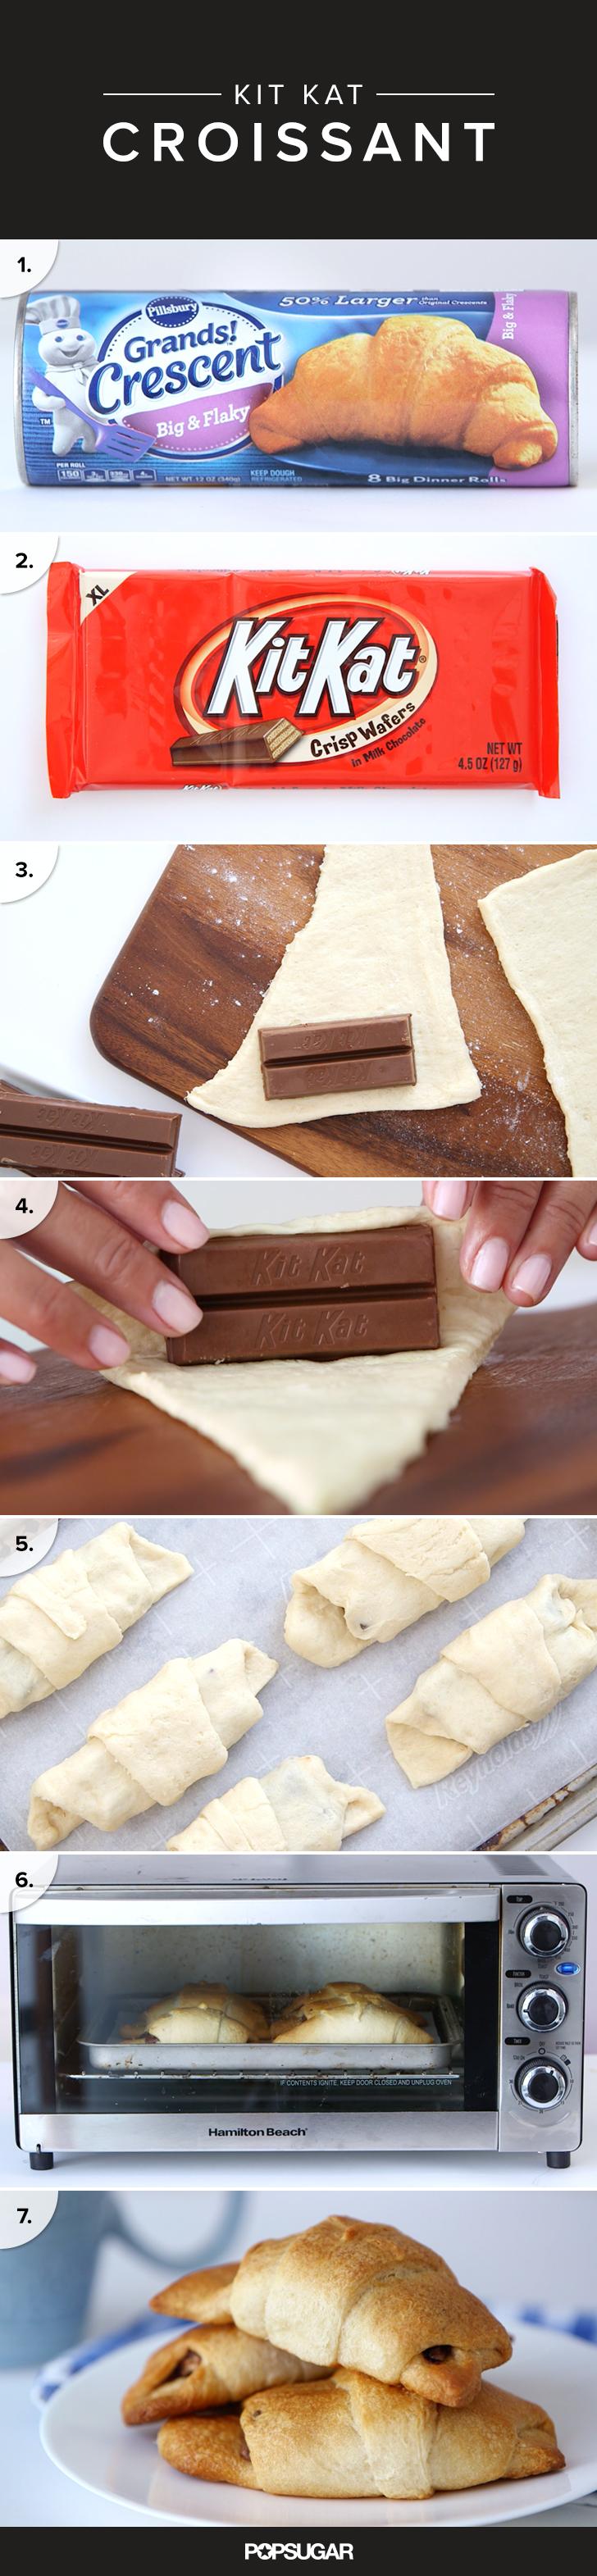 Kit Kat Croissant Recipe | POPSUGAR Food